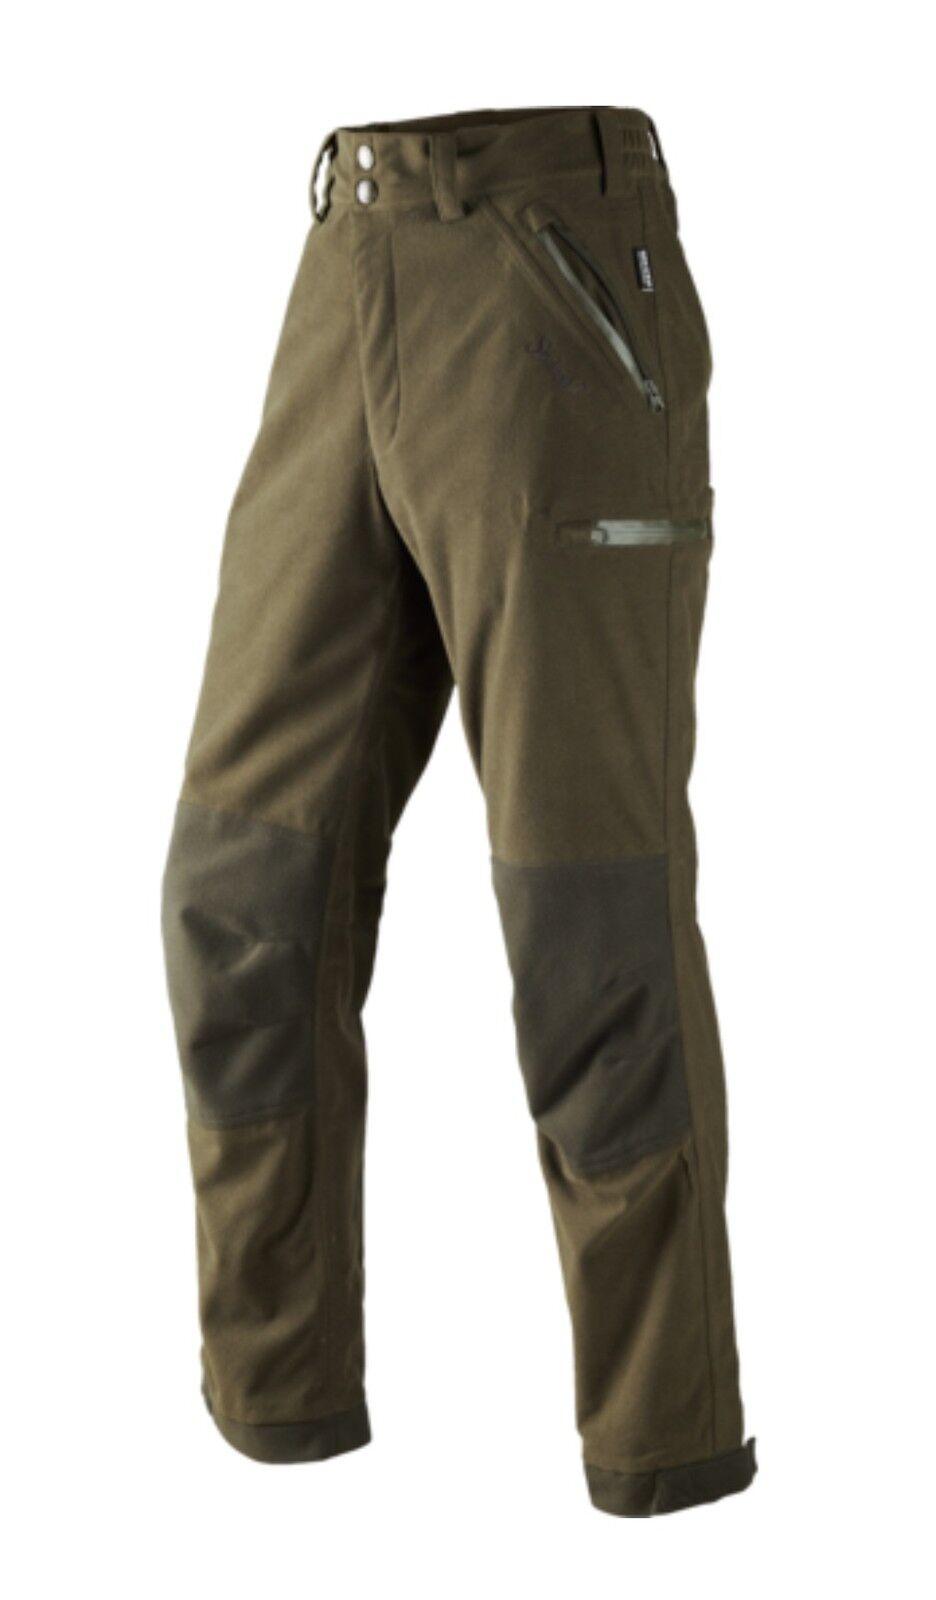 Seeland Eton Trousers Waterproof breathable Hunting Shooting Fishing game